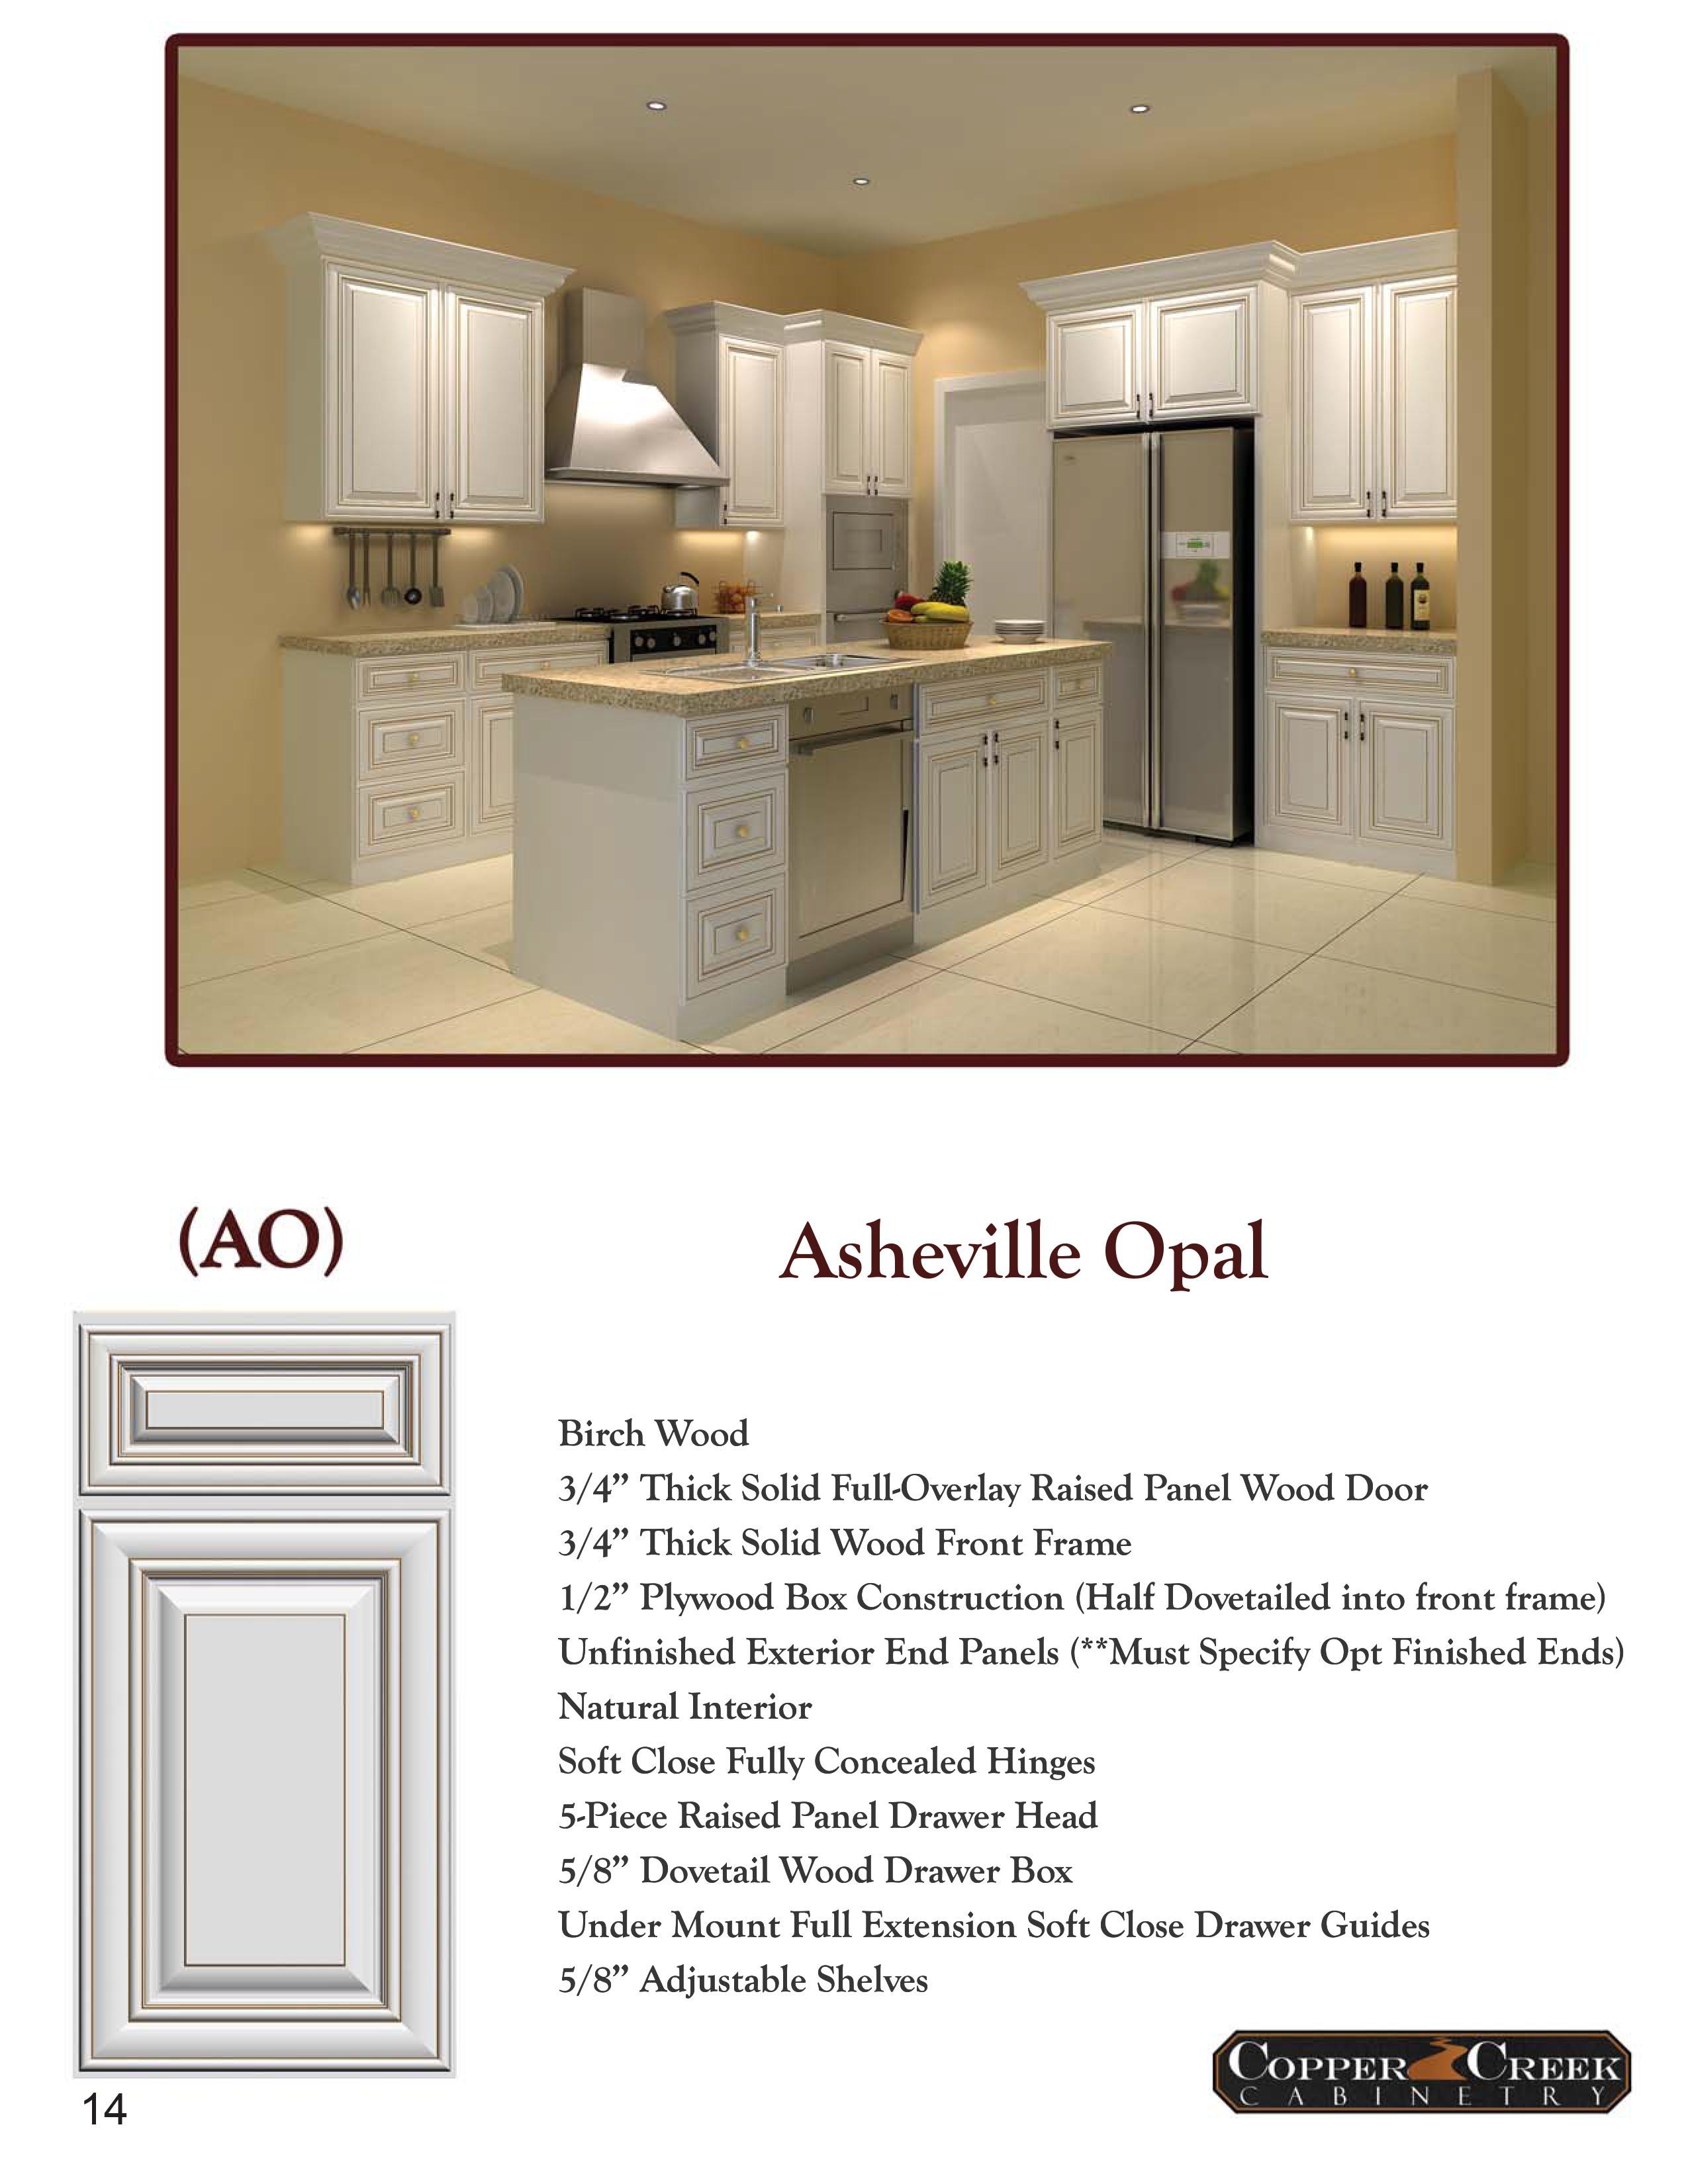 Asheville Opal page